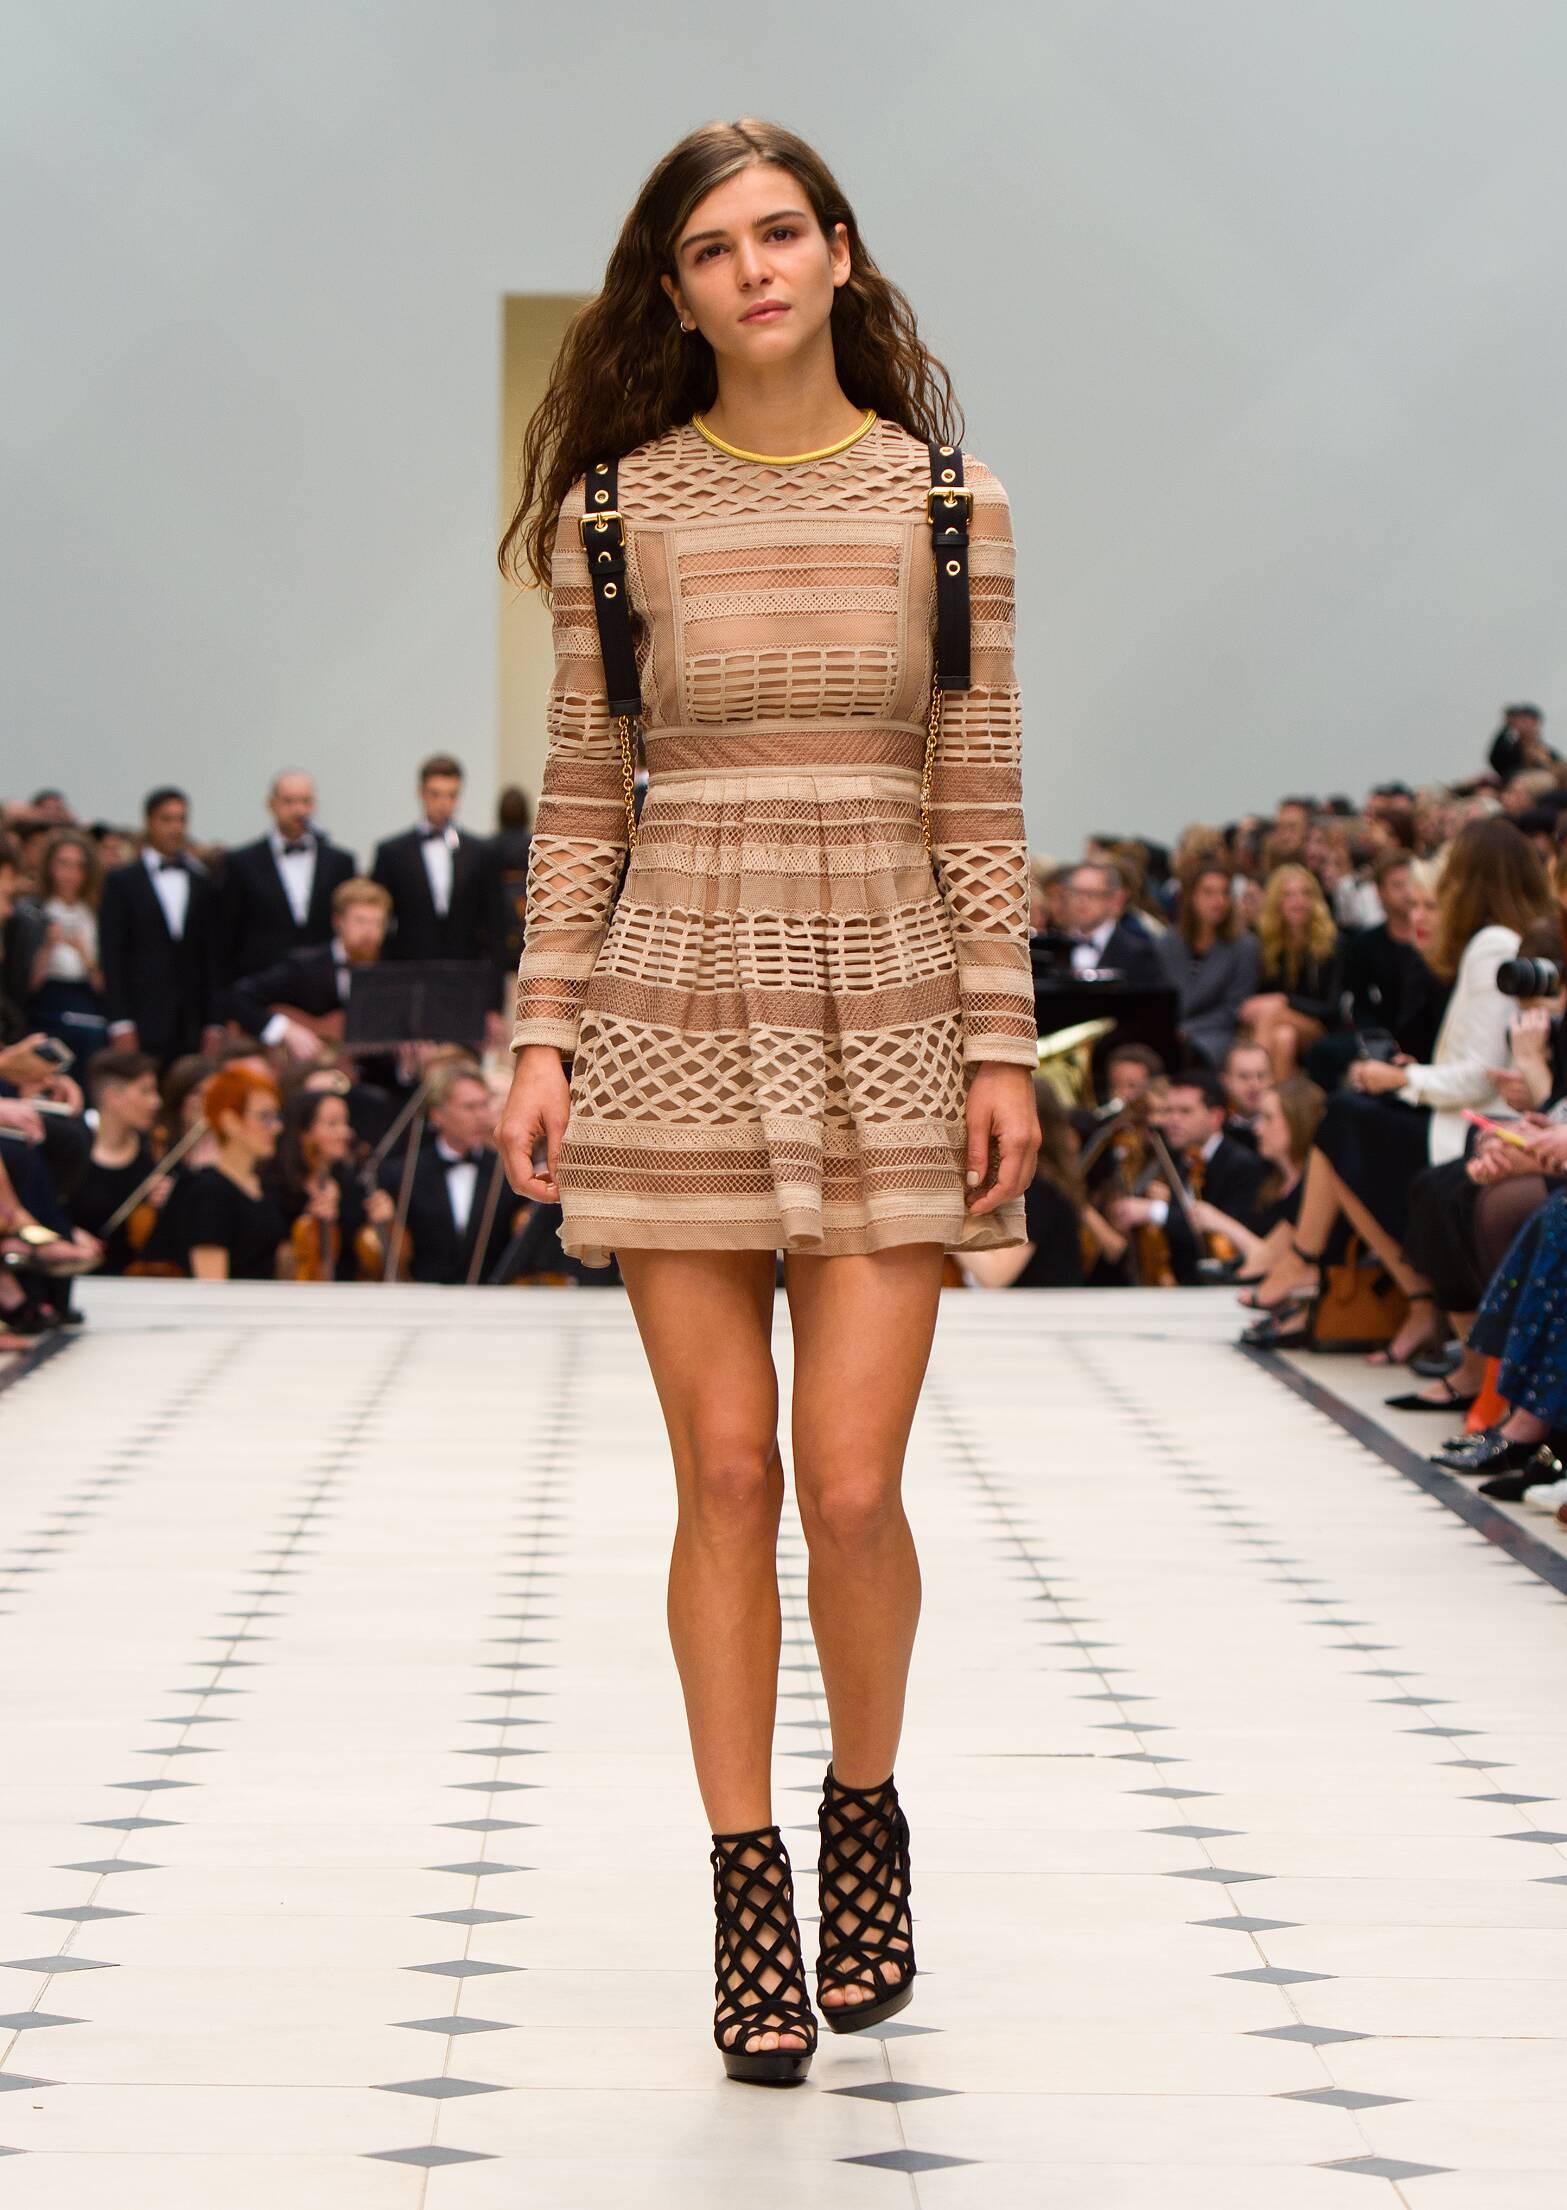 Fashion Woman Model Burberry Prorsum Catwalk